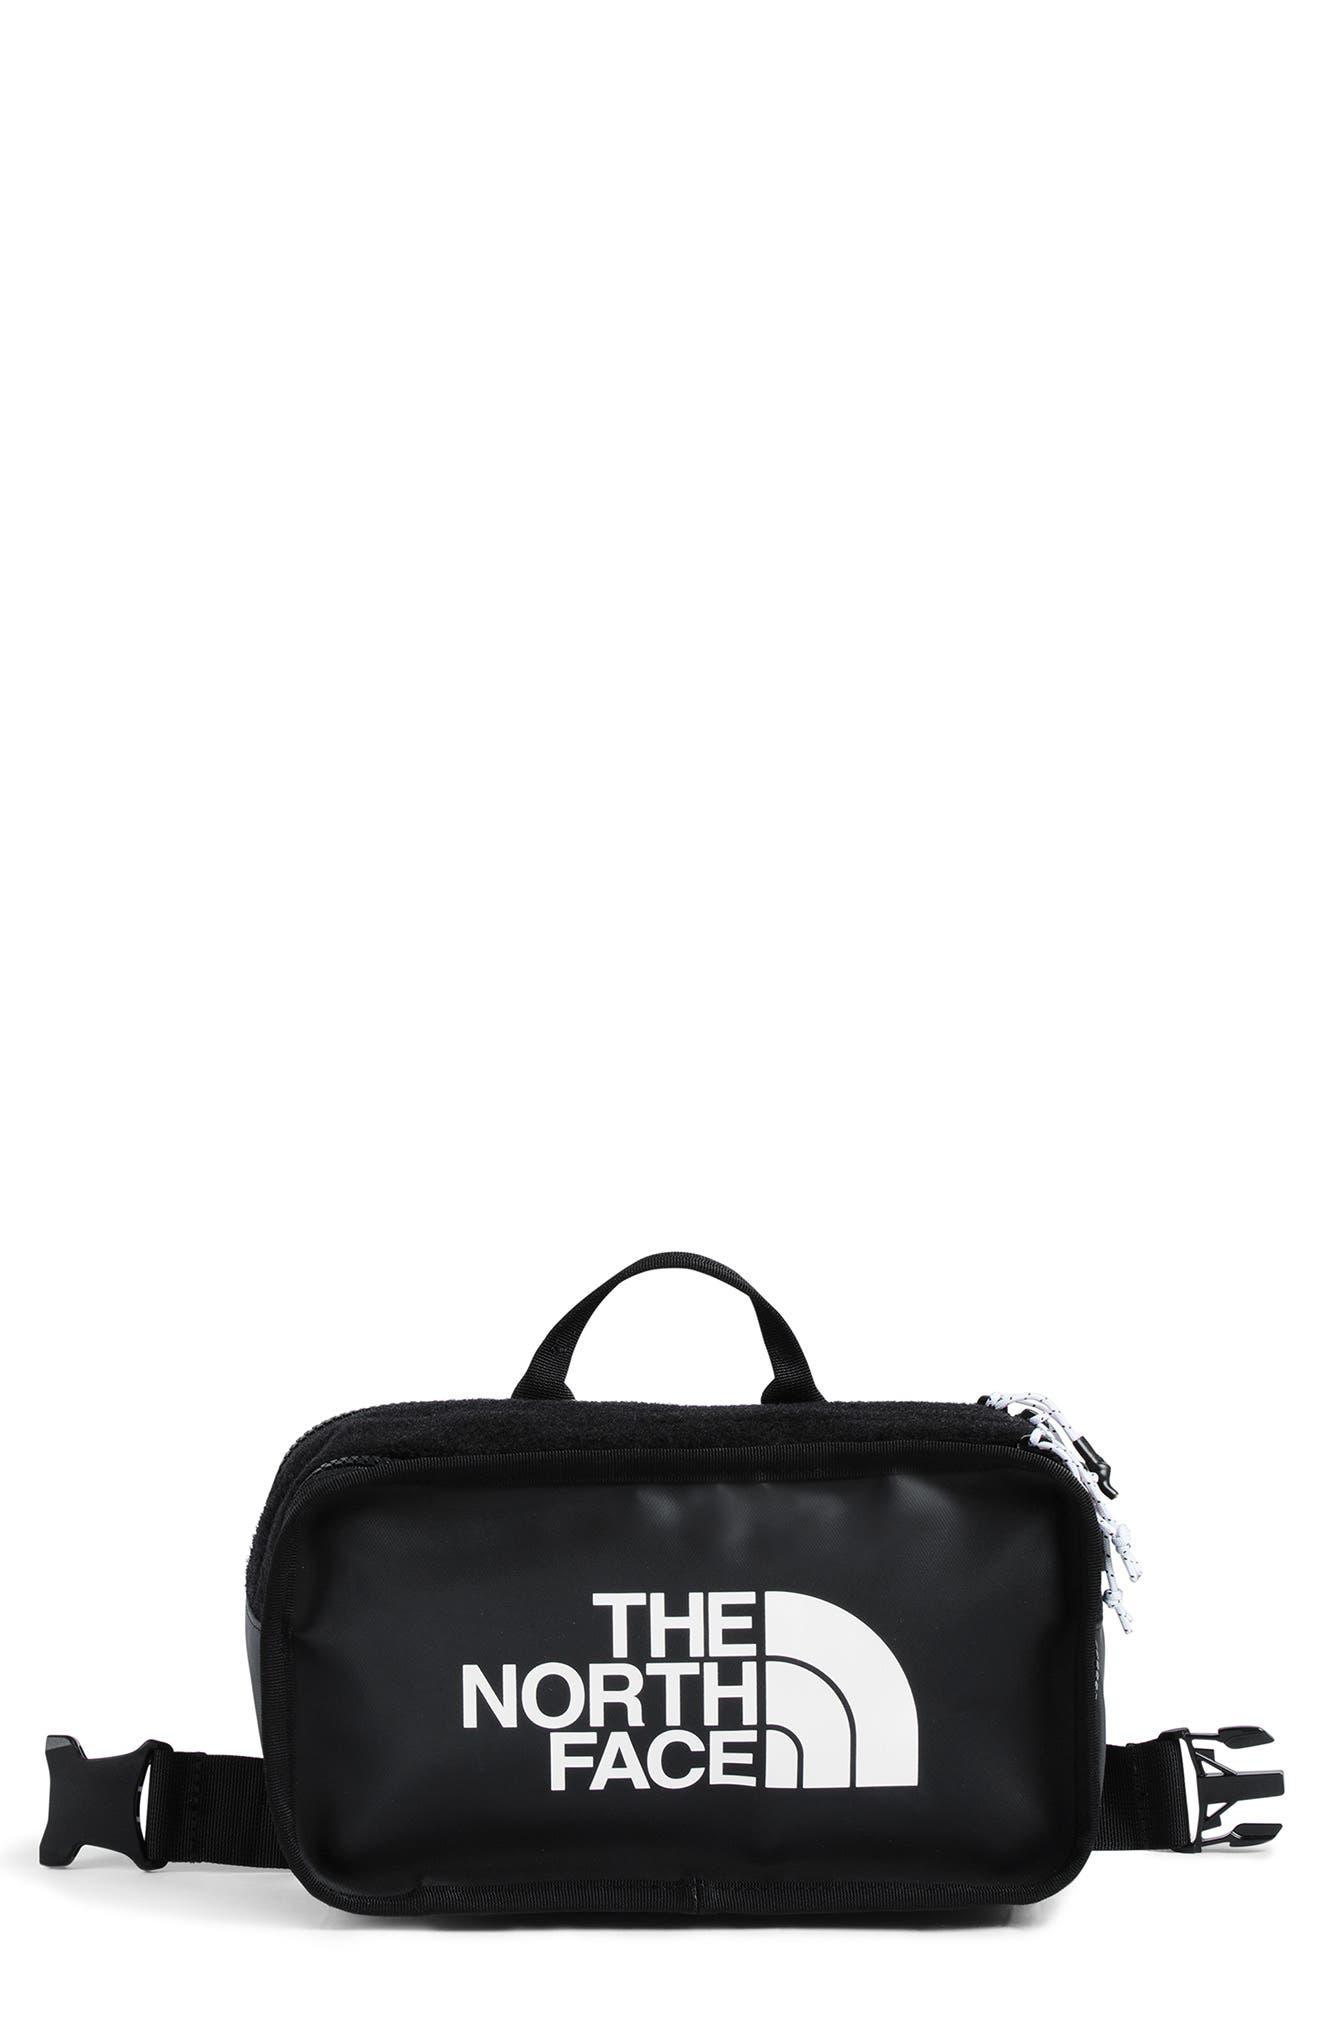 The North Face Explore Water Resistant Belt Bag - Black